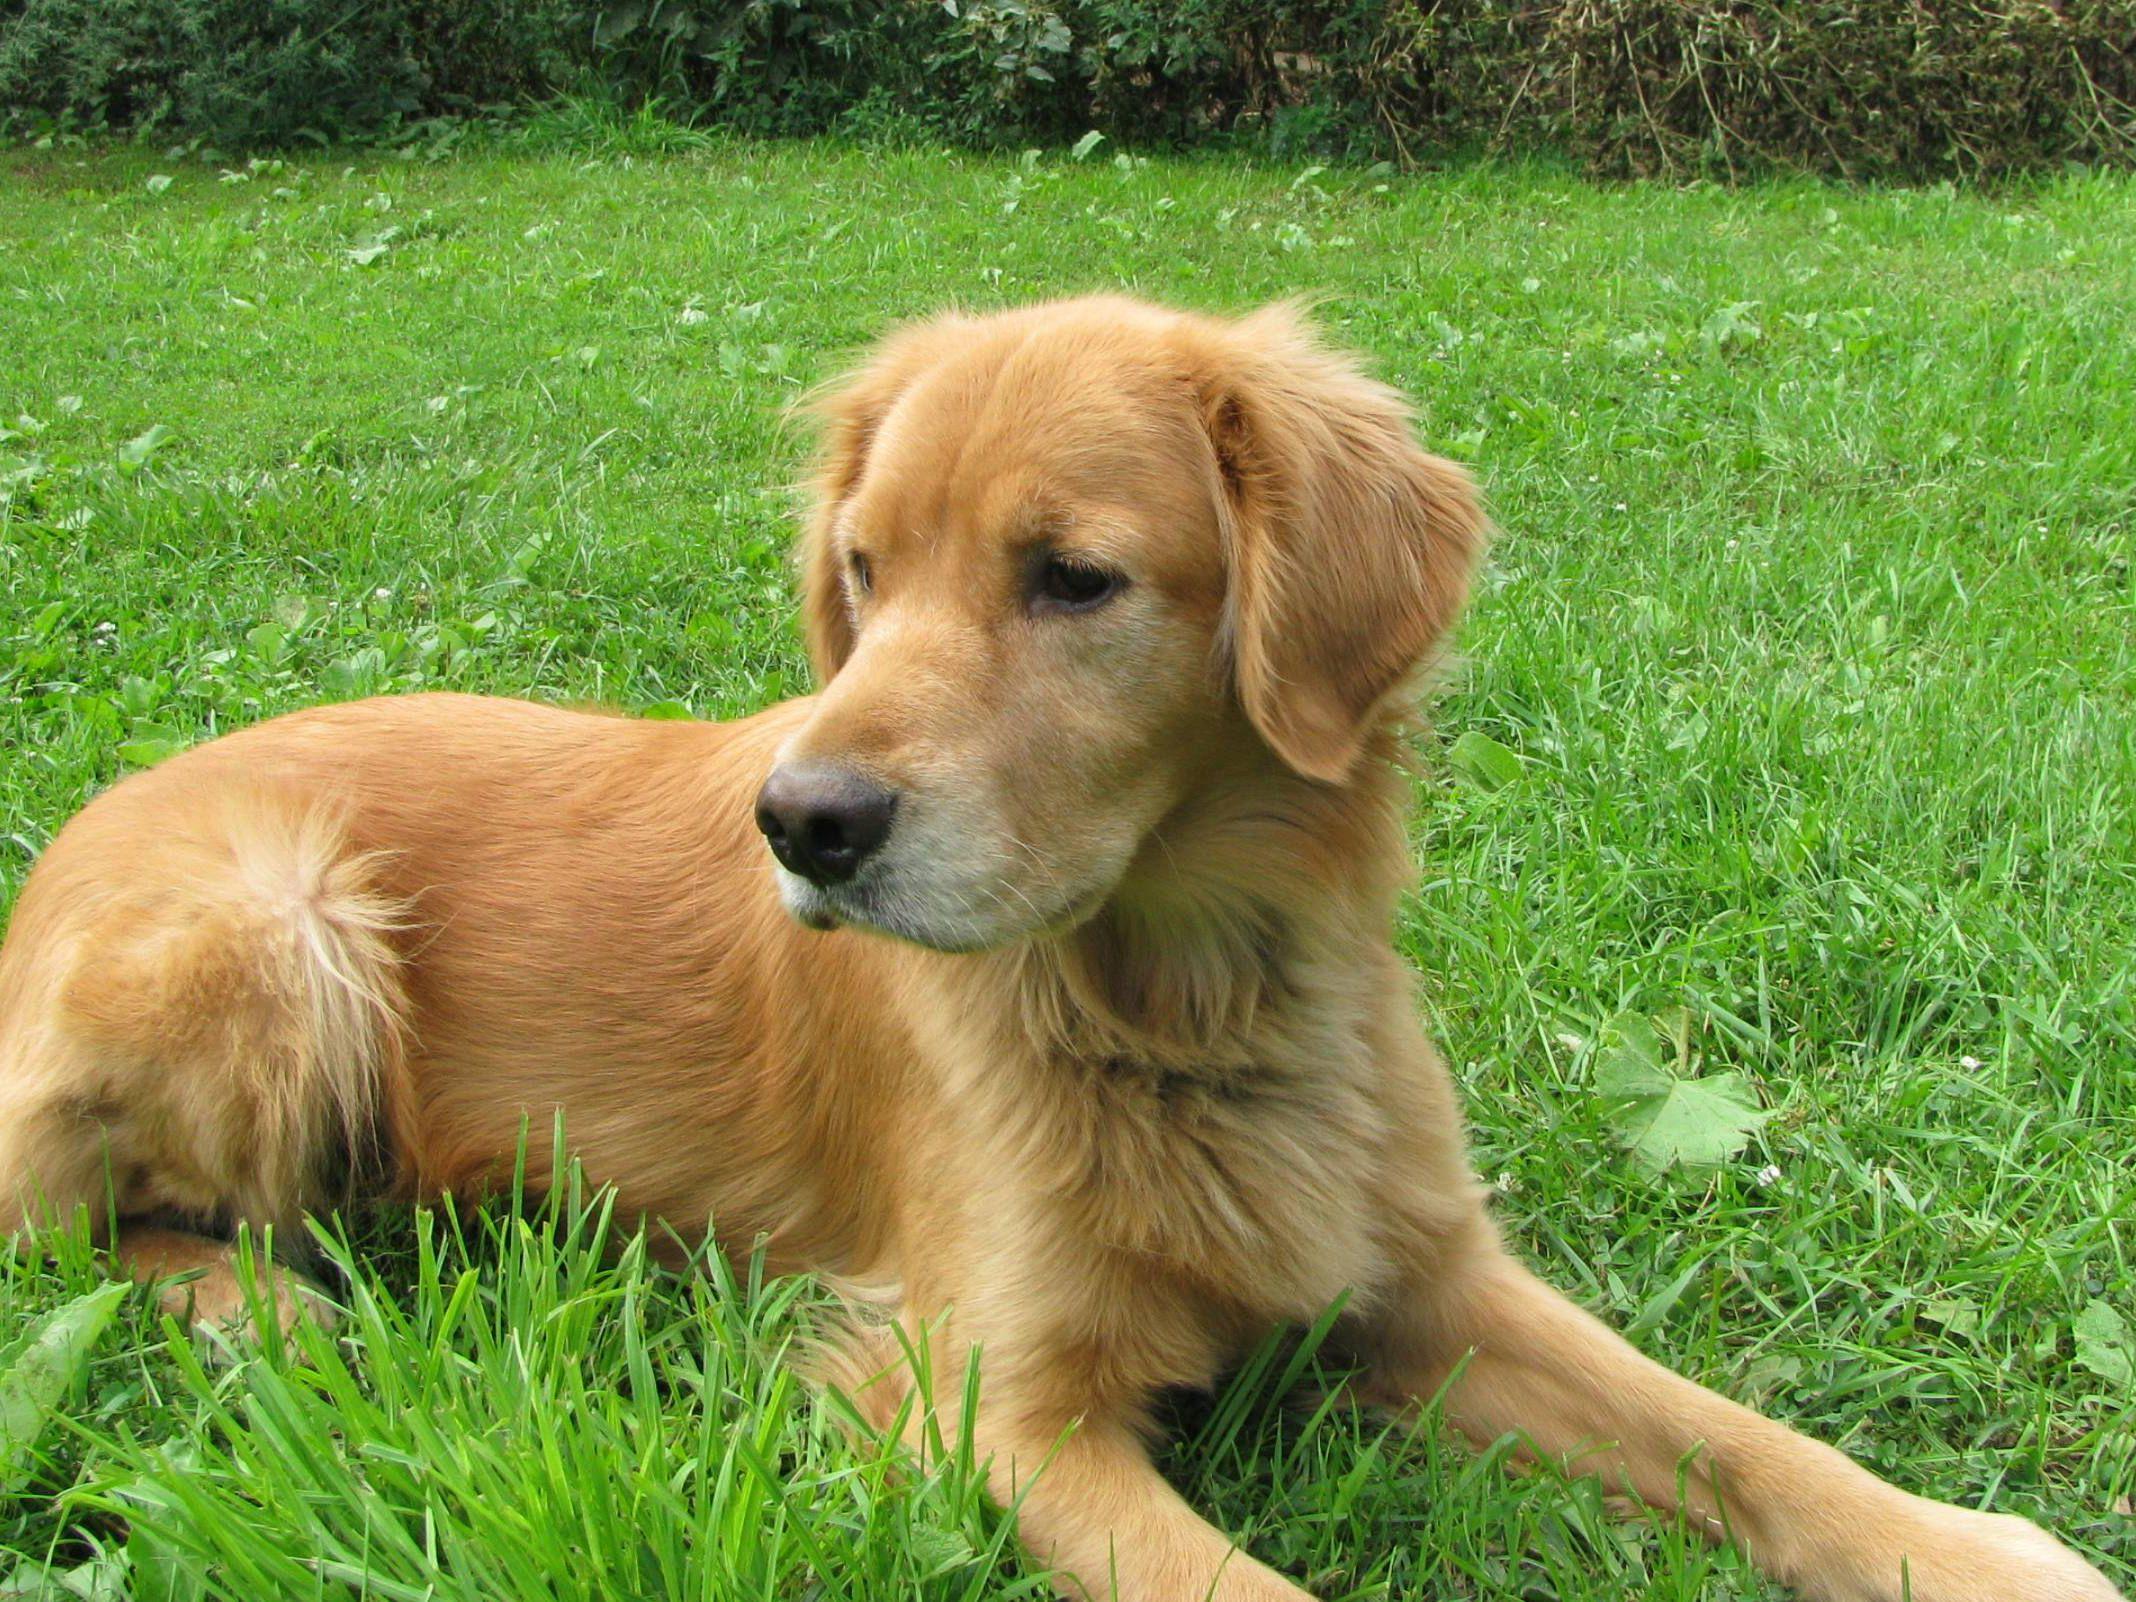 Golden Retriever Rescue Resource Toledo Dog Adoptions Golden Retriever Golden Retriever Adoption Golden Retriever Rescue